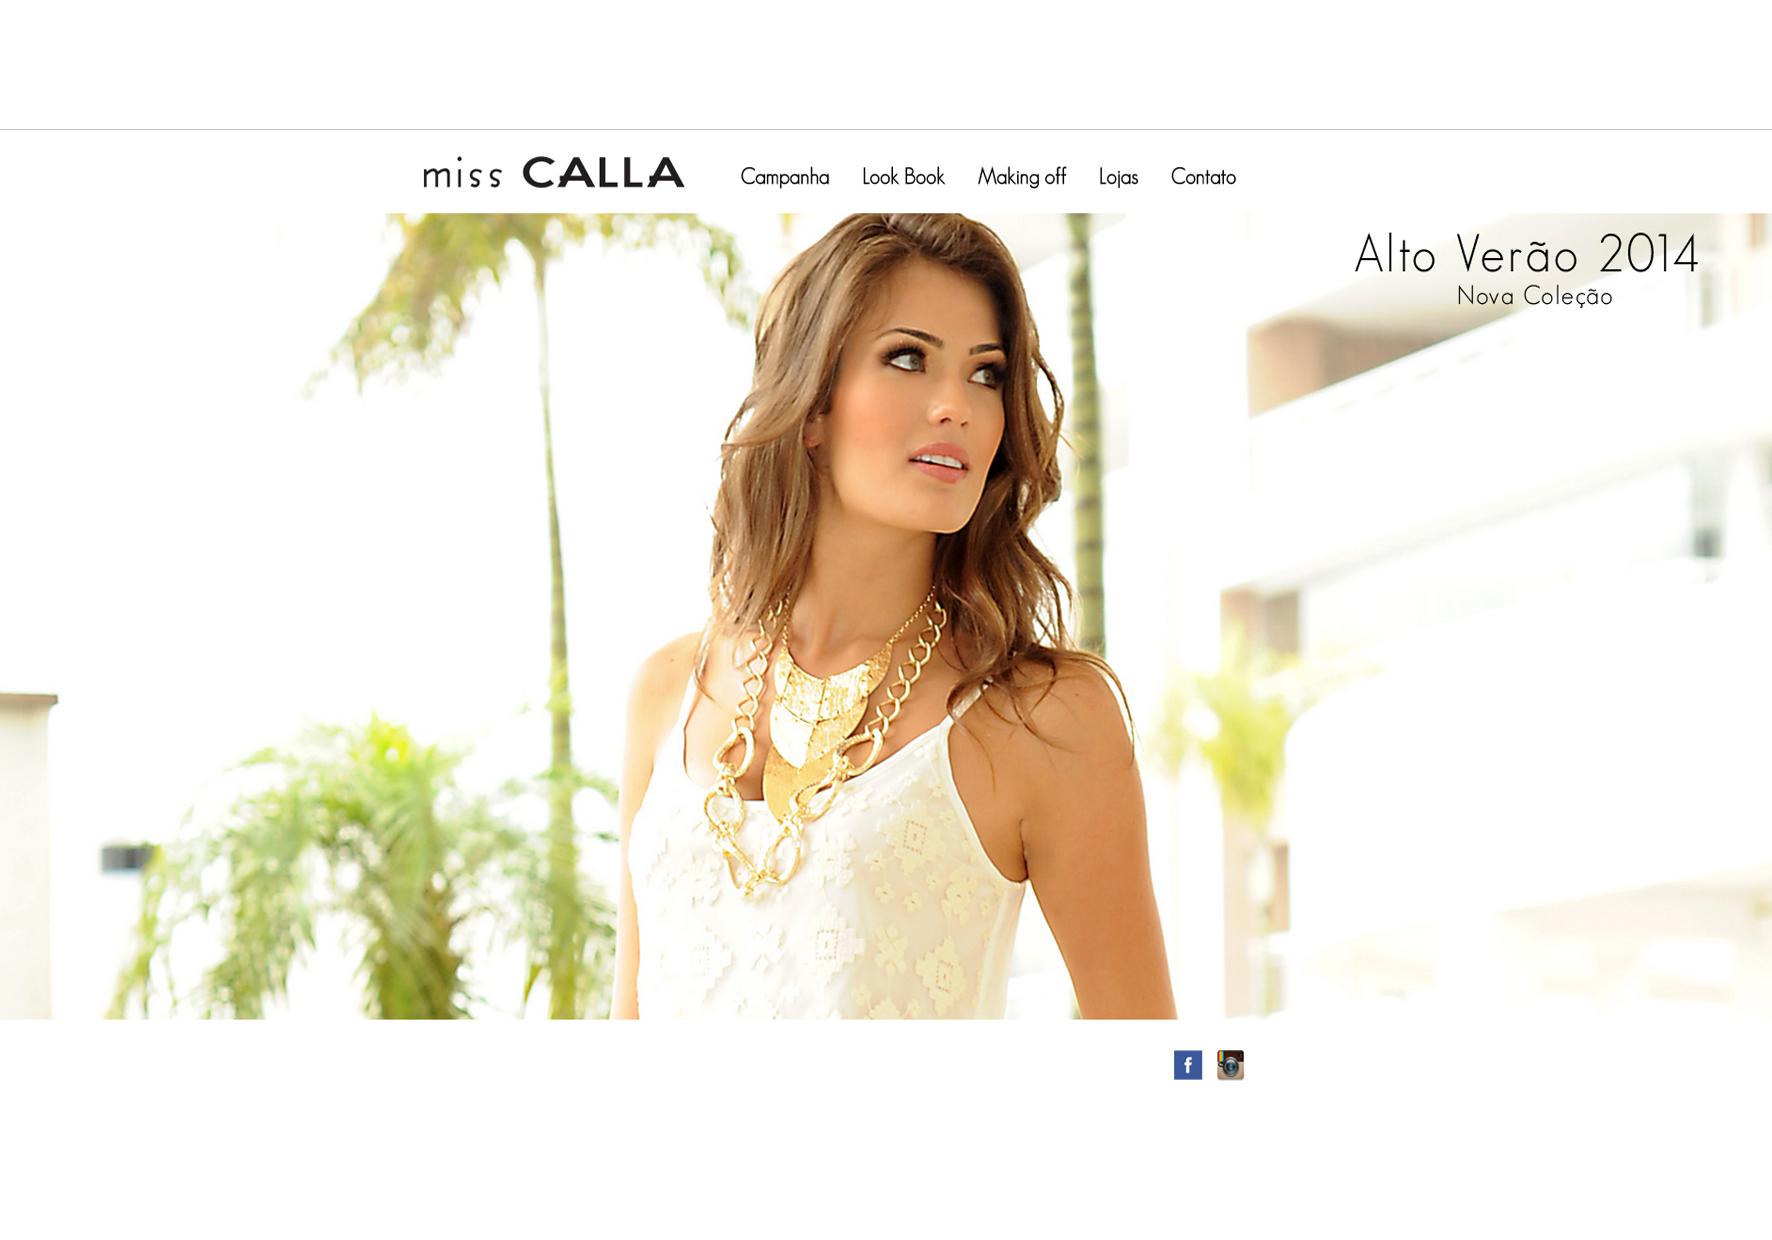 Miss Calla